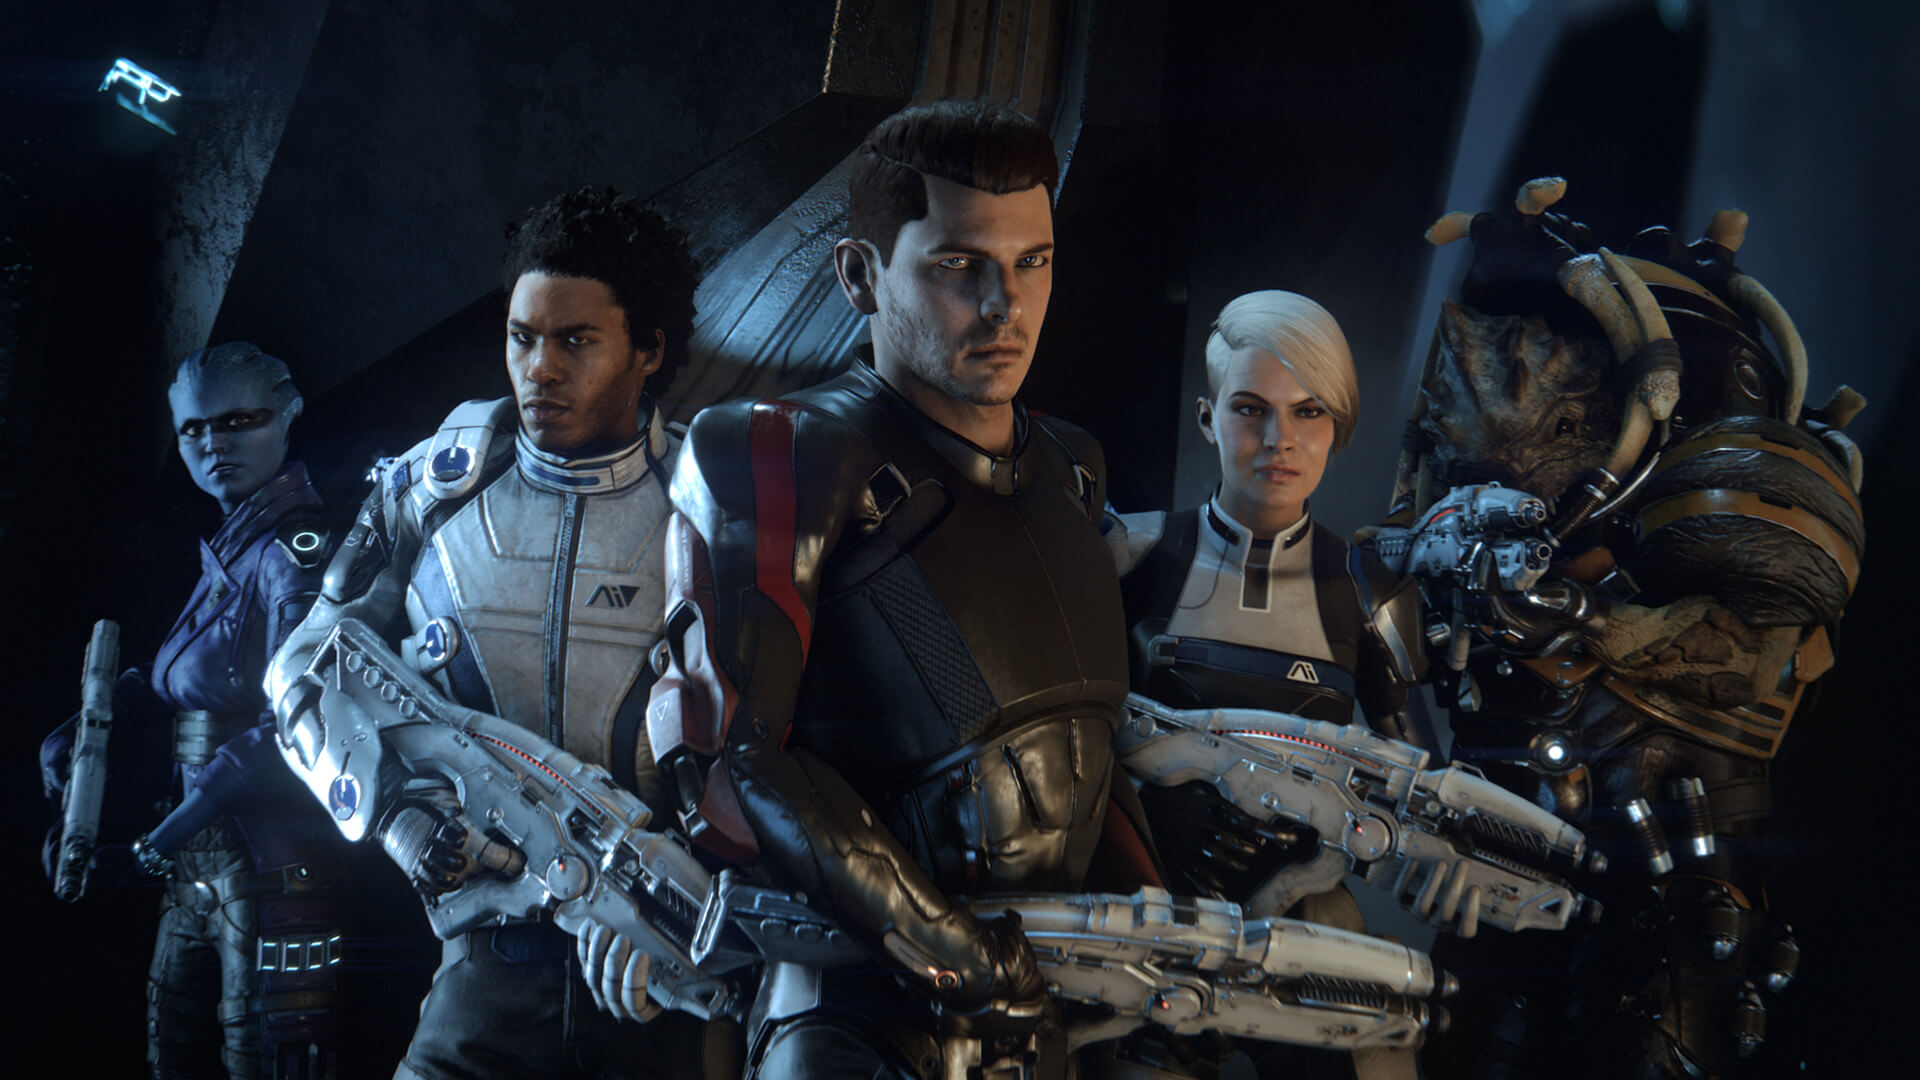 Mass Effect Andromeda - Mass Effect: Andromeda